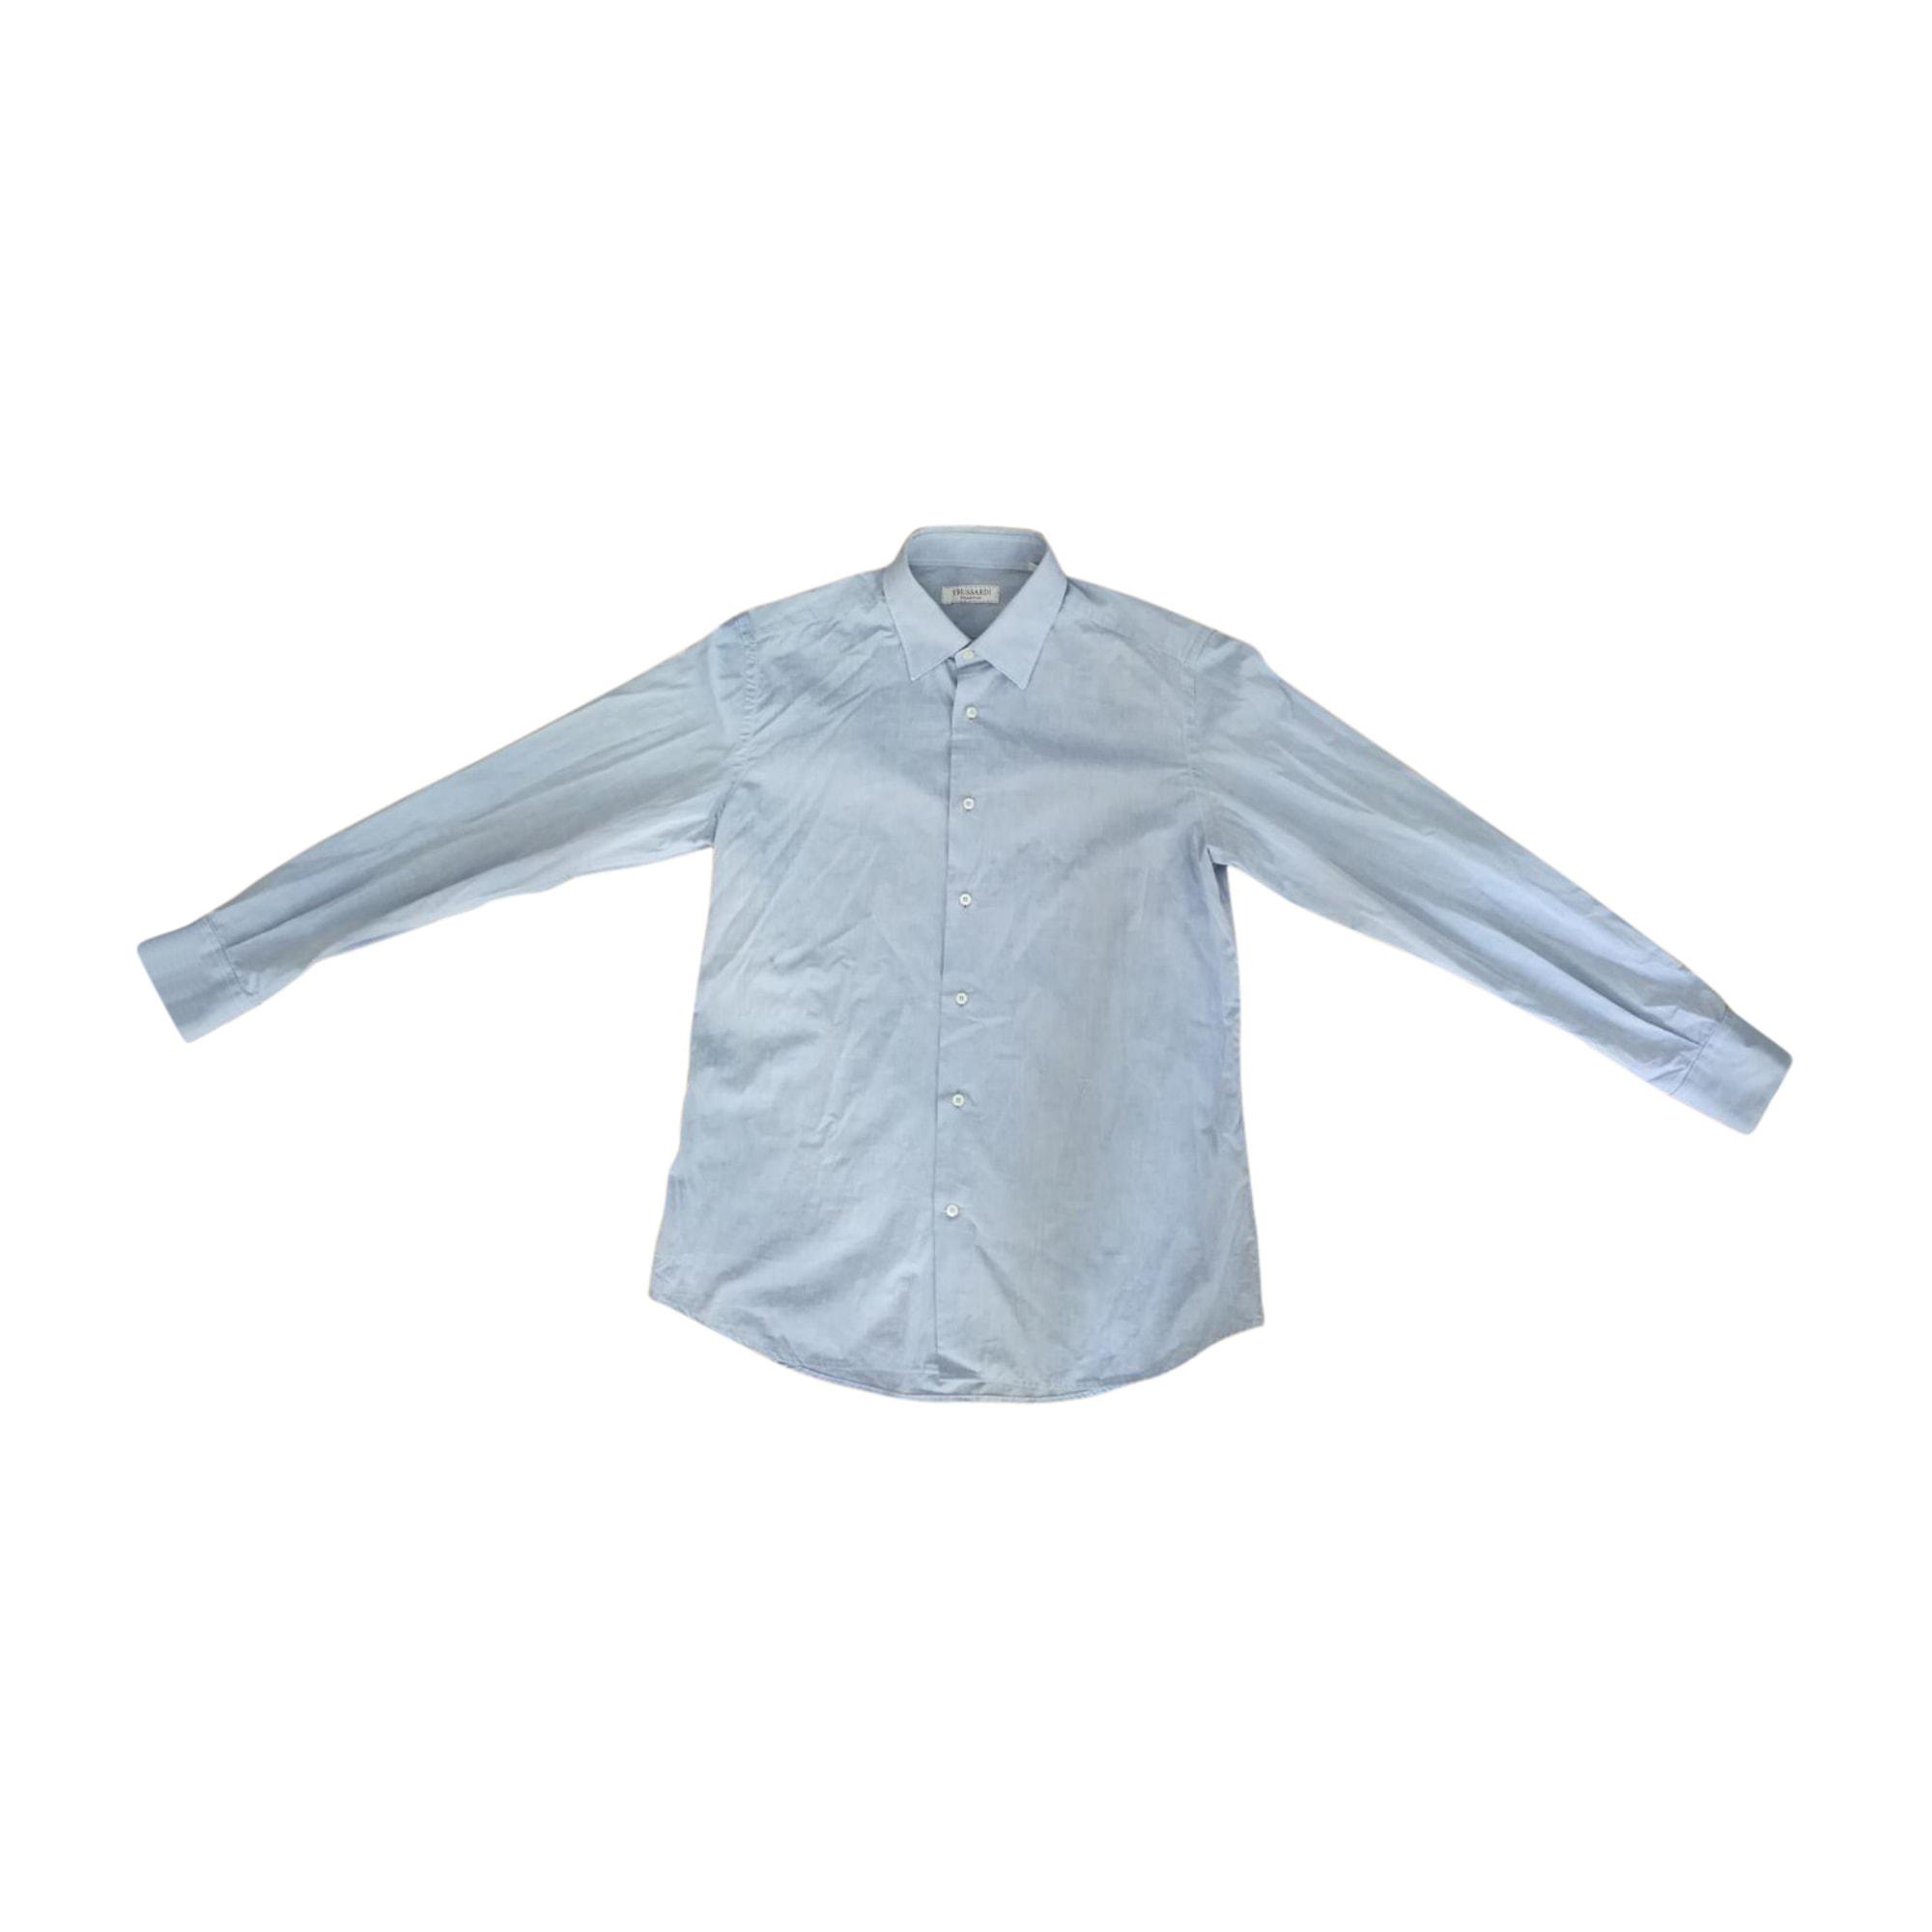 Shirt TRUSSARDI Blue, navy, turquoise